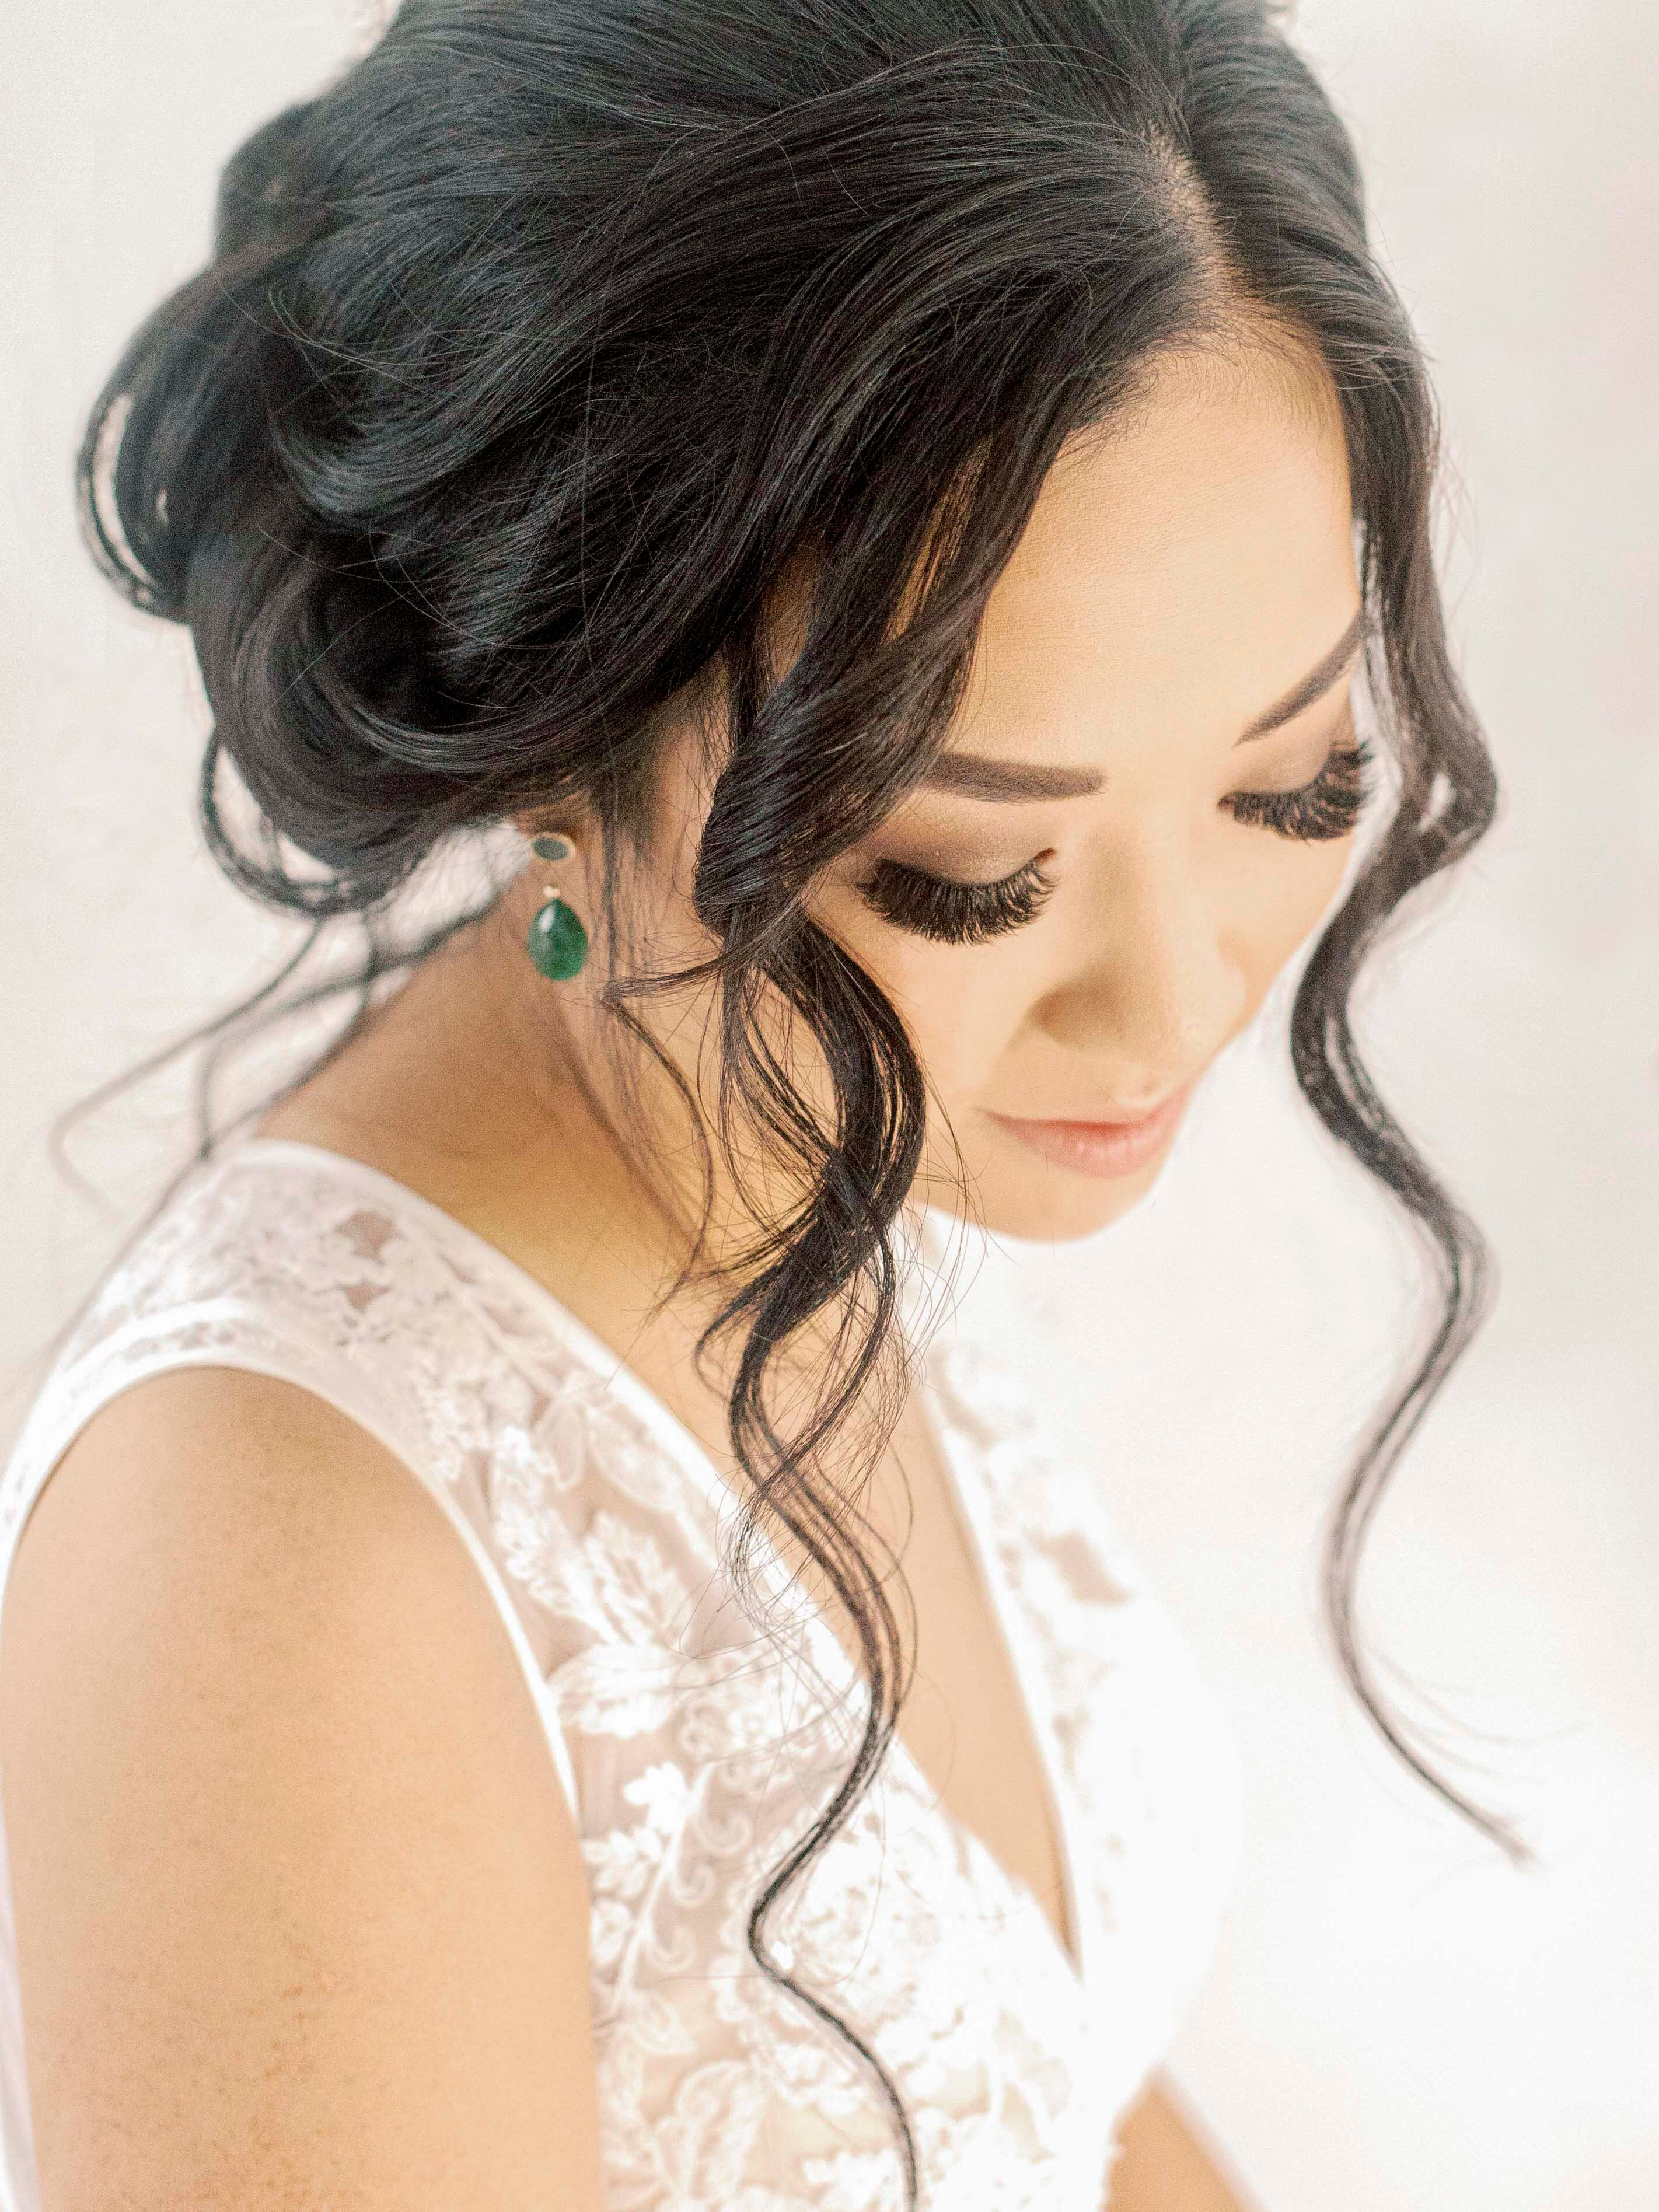 maggie's hair & bridal | beauty - salt lake city, ut